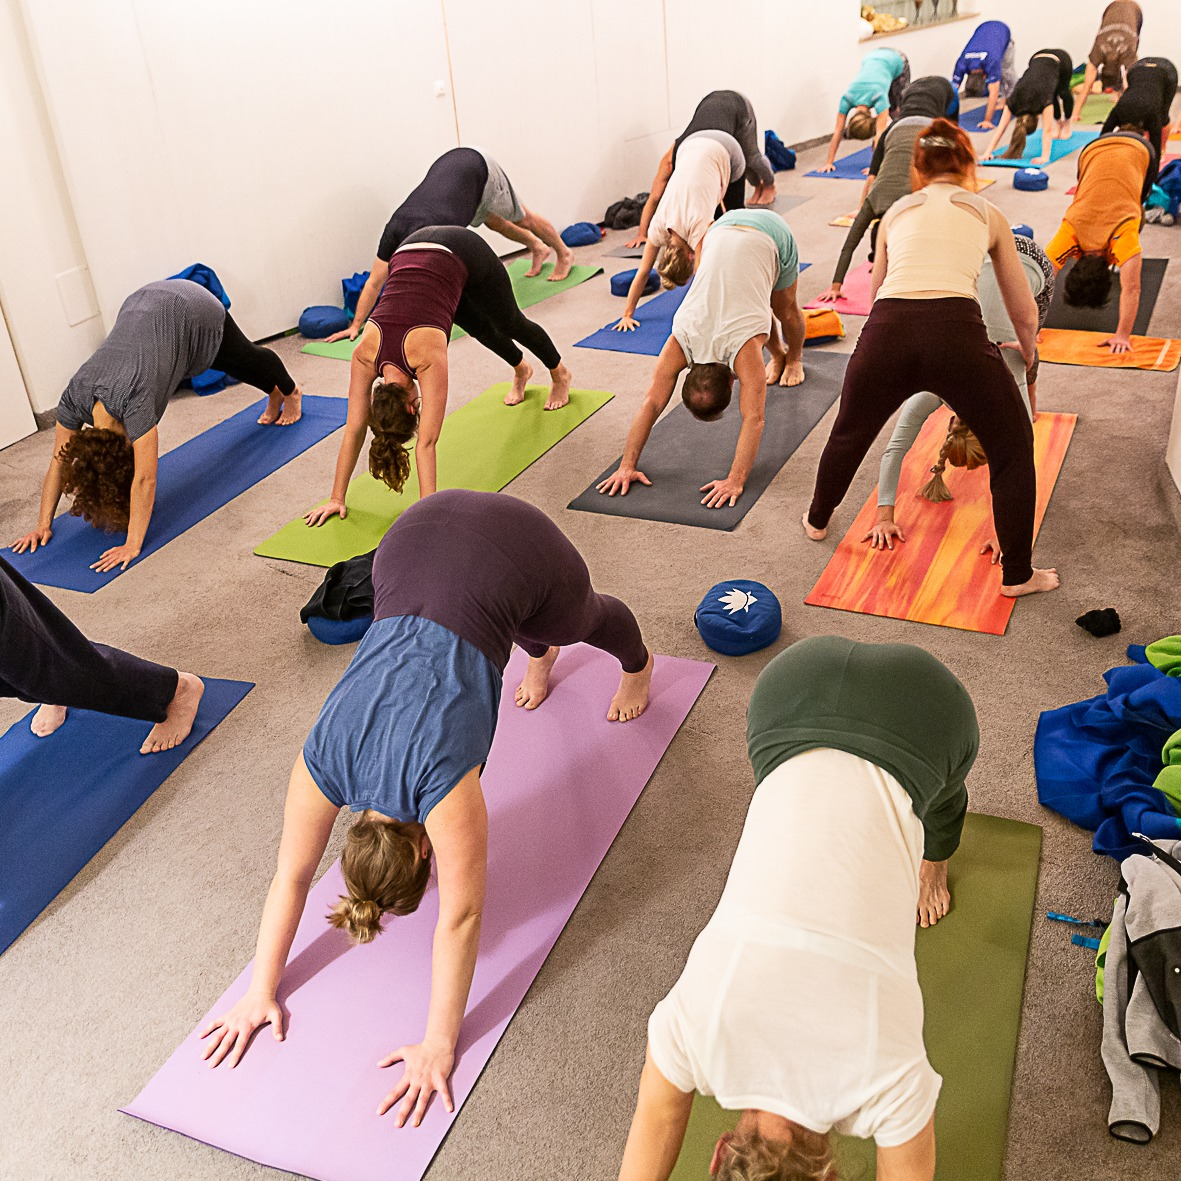 Yogakurs für Fortgeschrittene im Santosha Yoga Augsburg